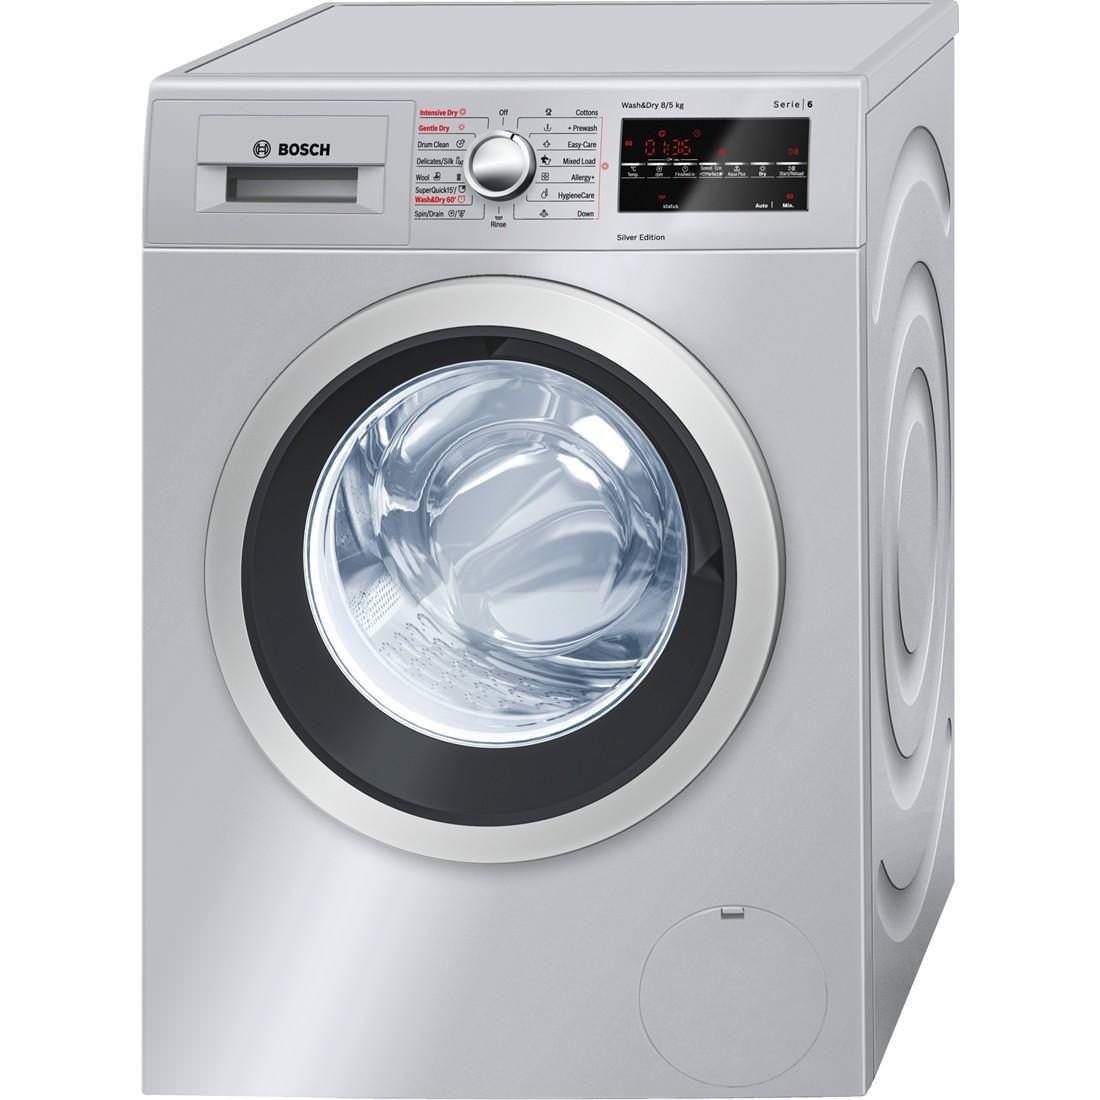 Pin On Washing Machines On Sale